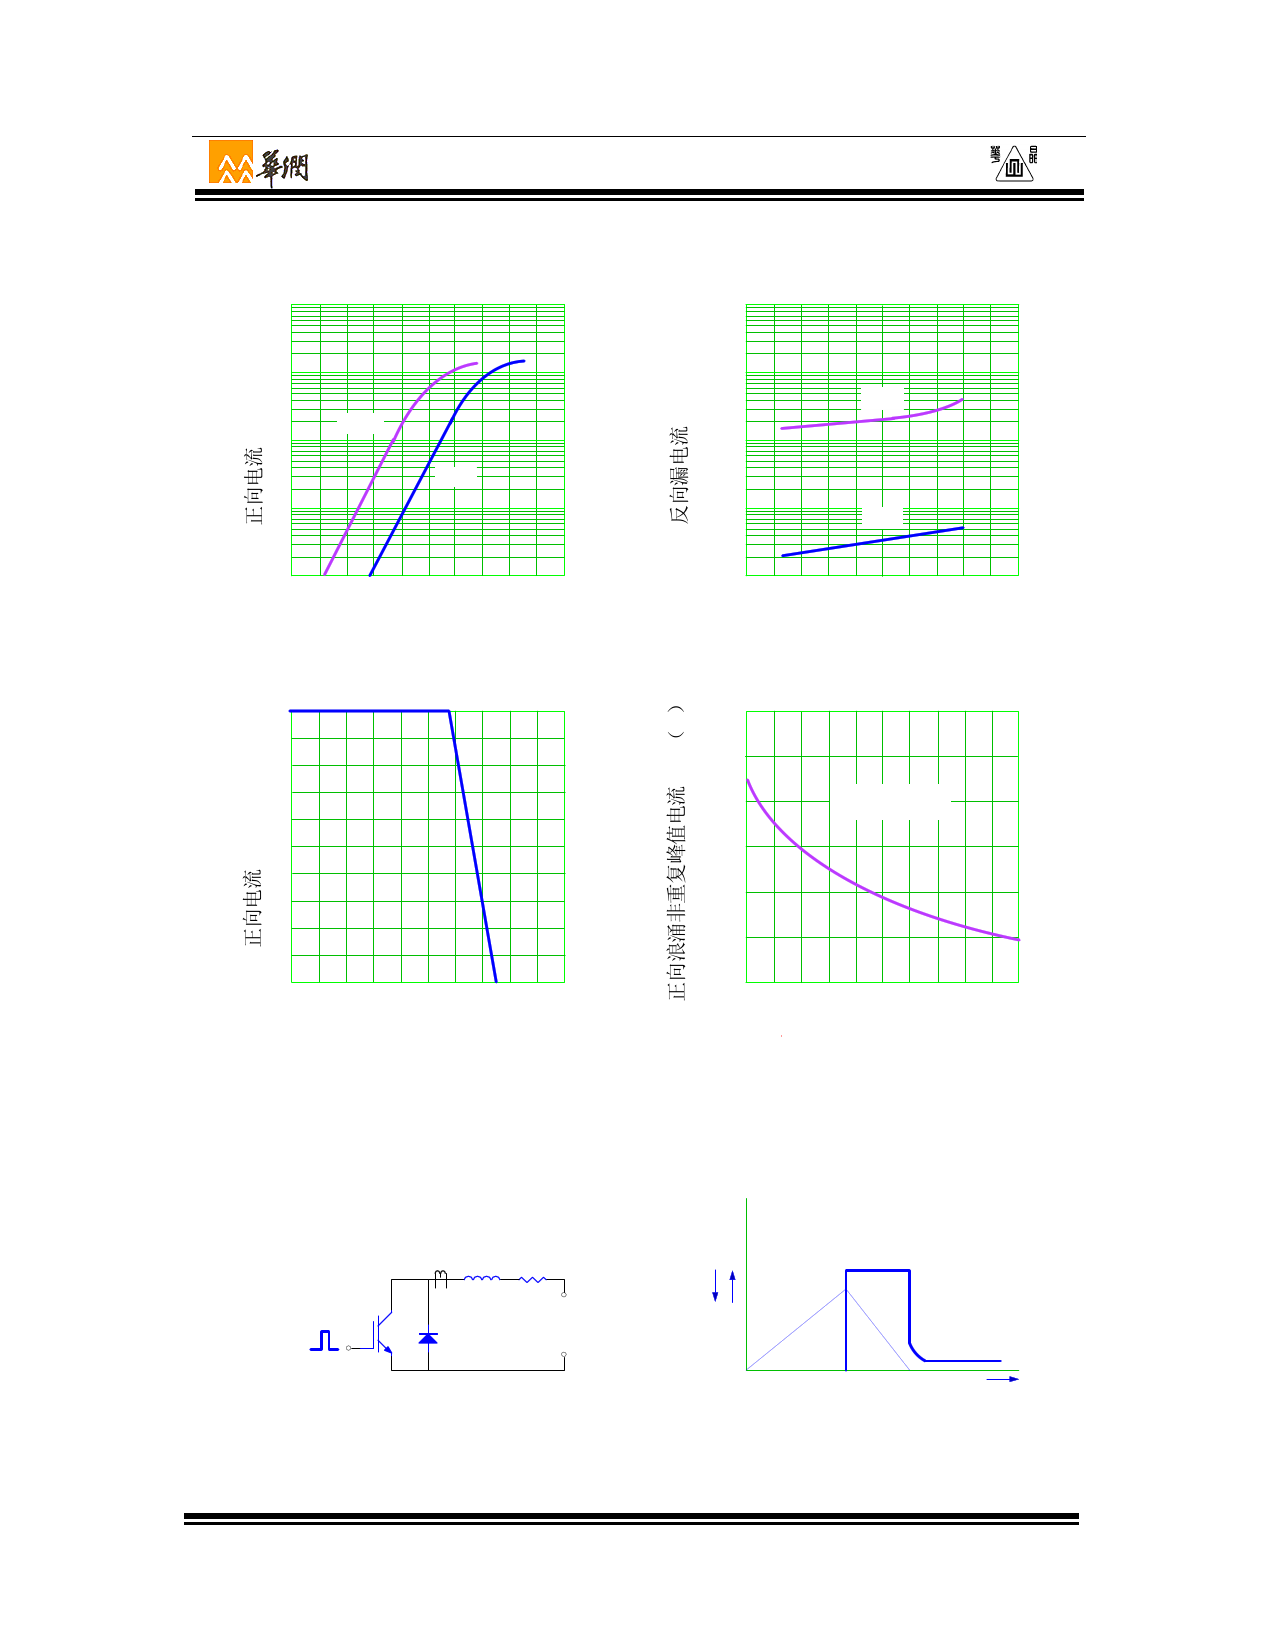 2CR106A8C pdf, ピン配列